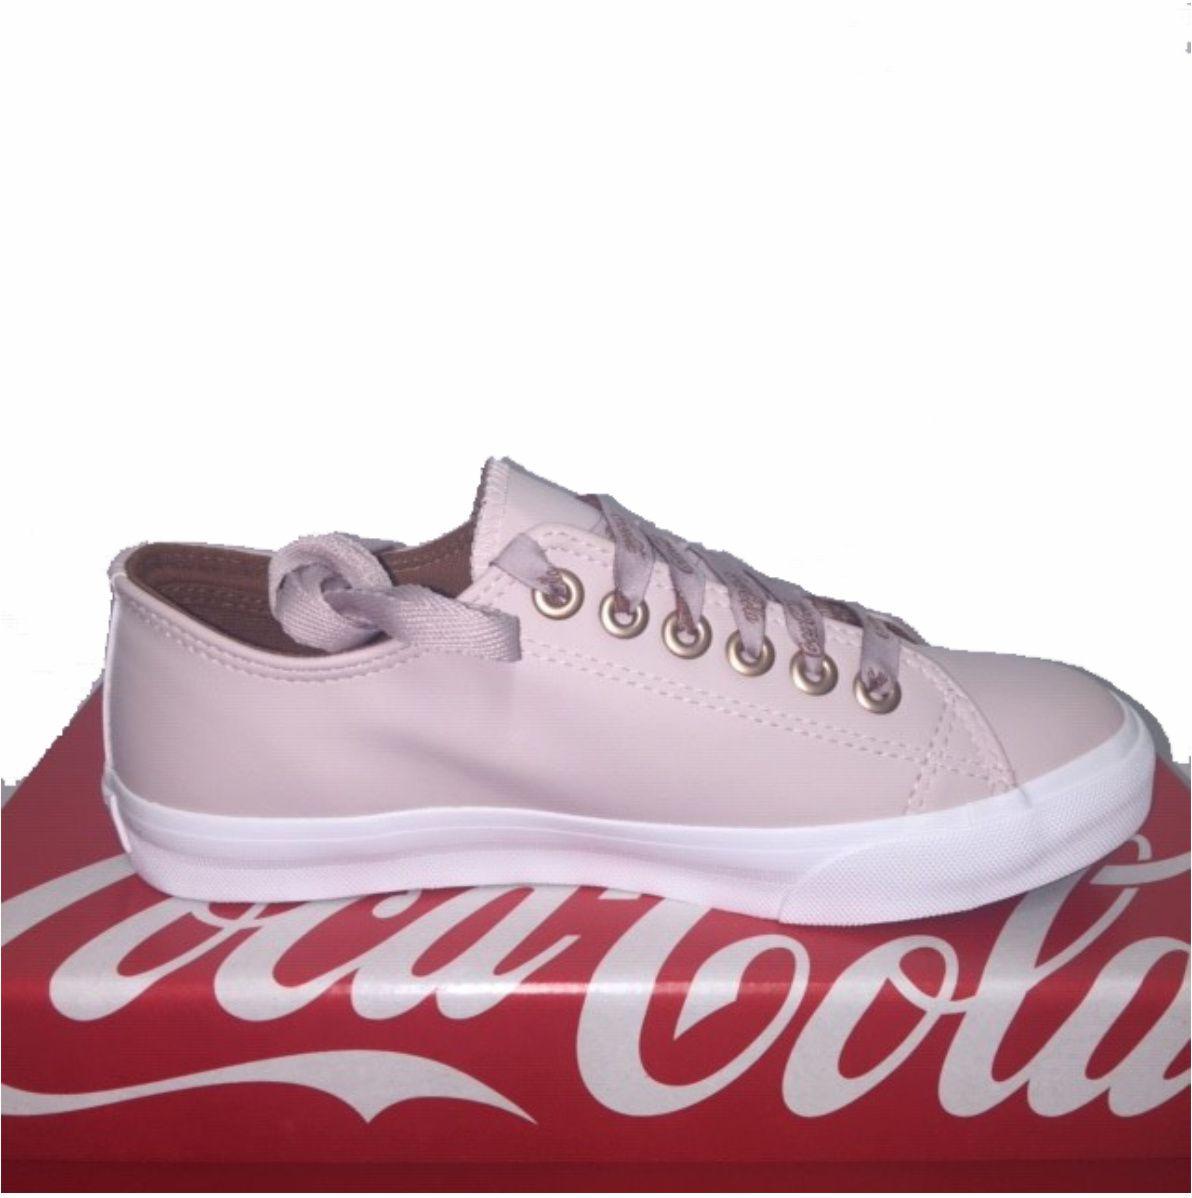 Tenis Coca Cola Basket Floater Cc1597 Rose